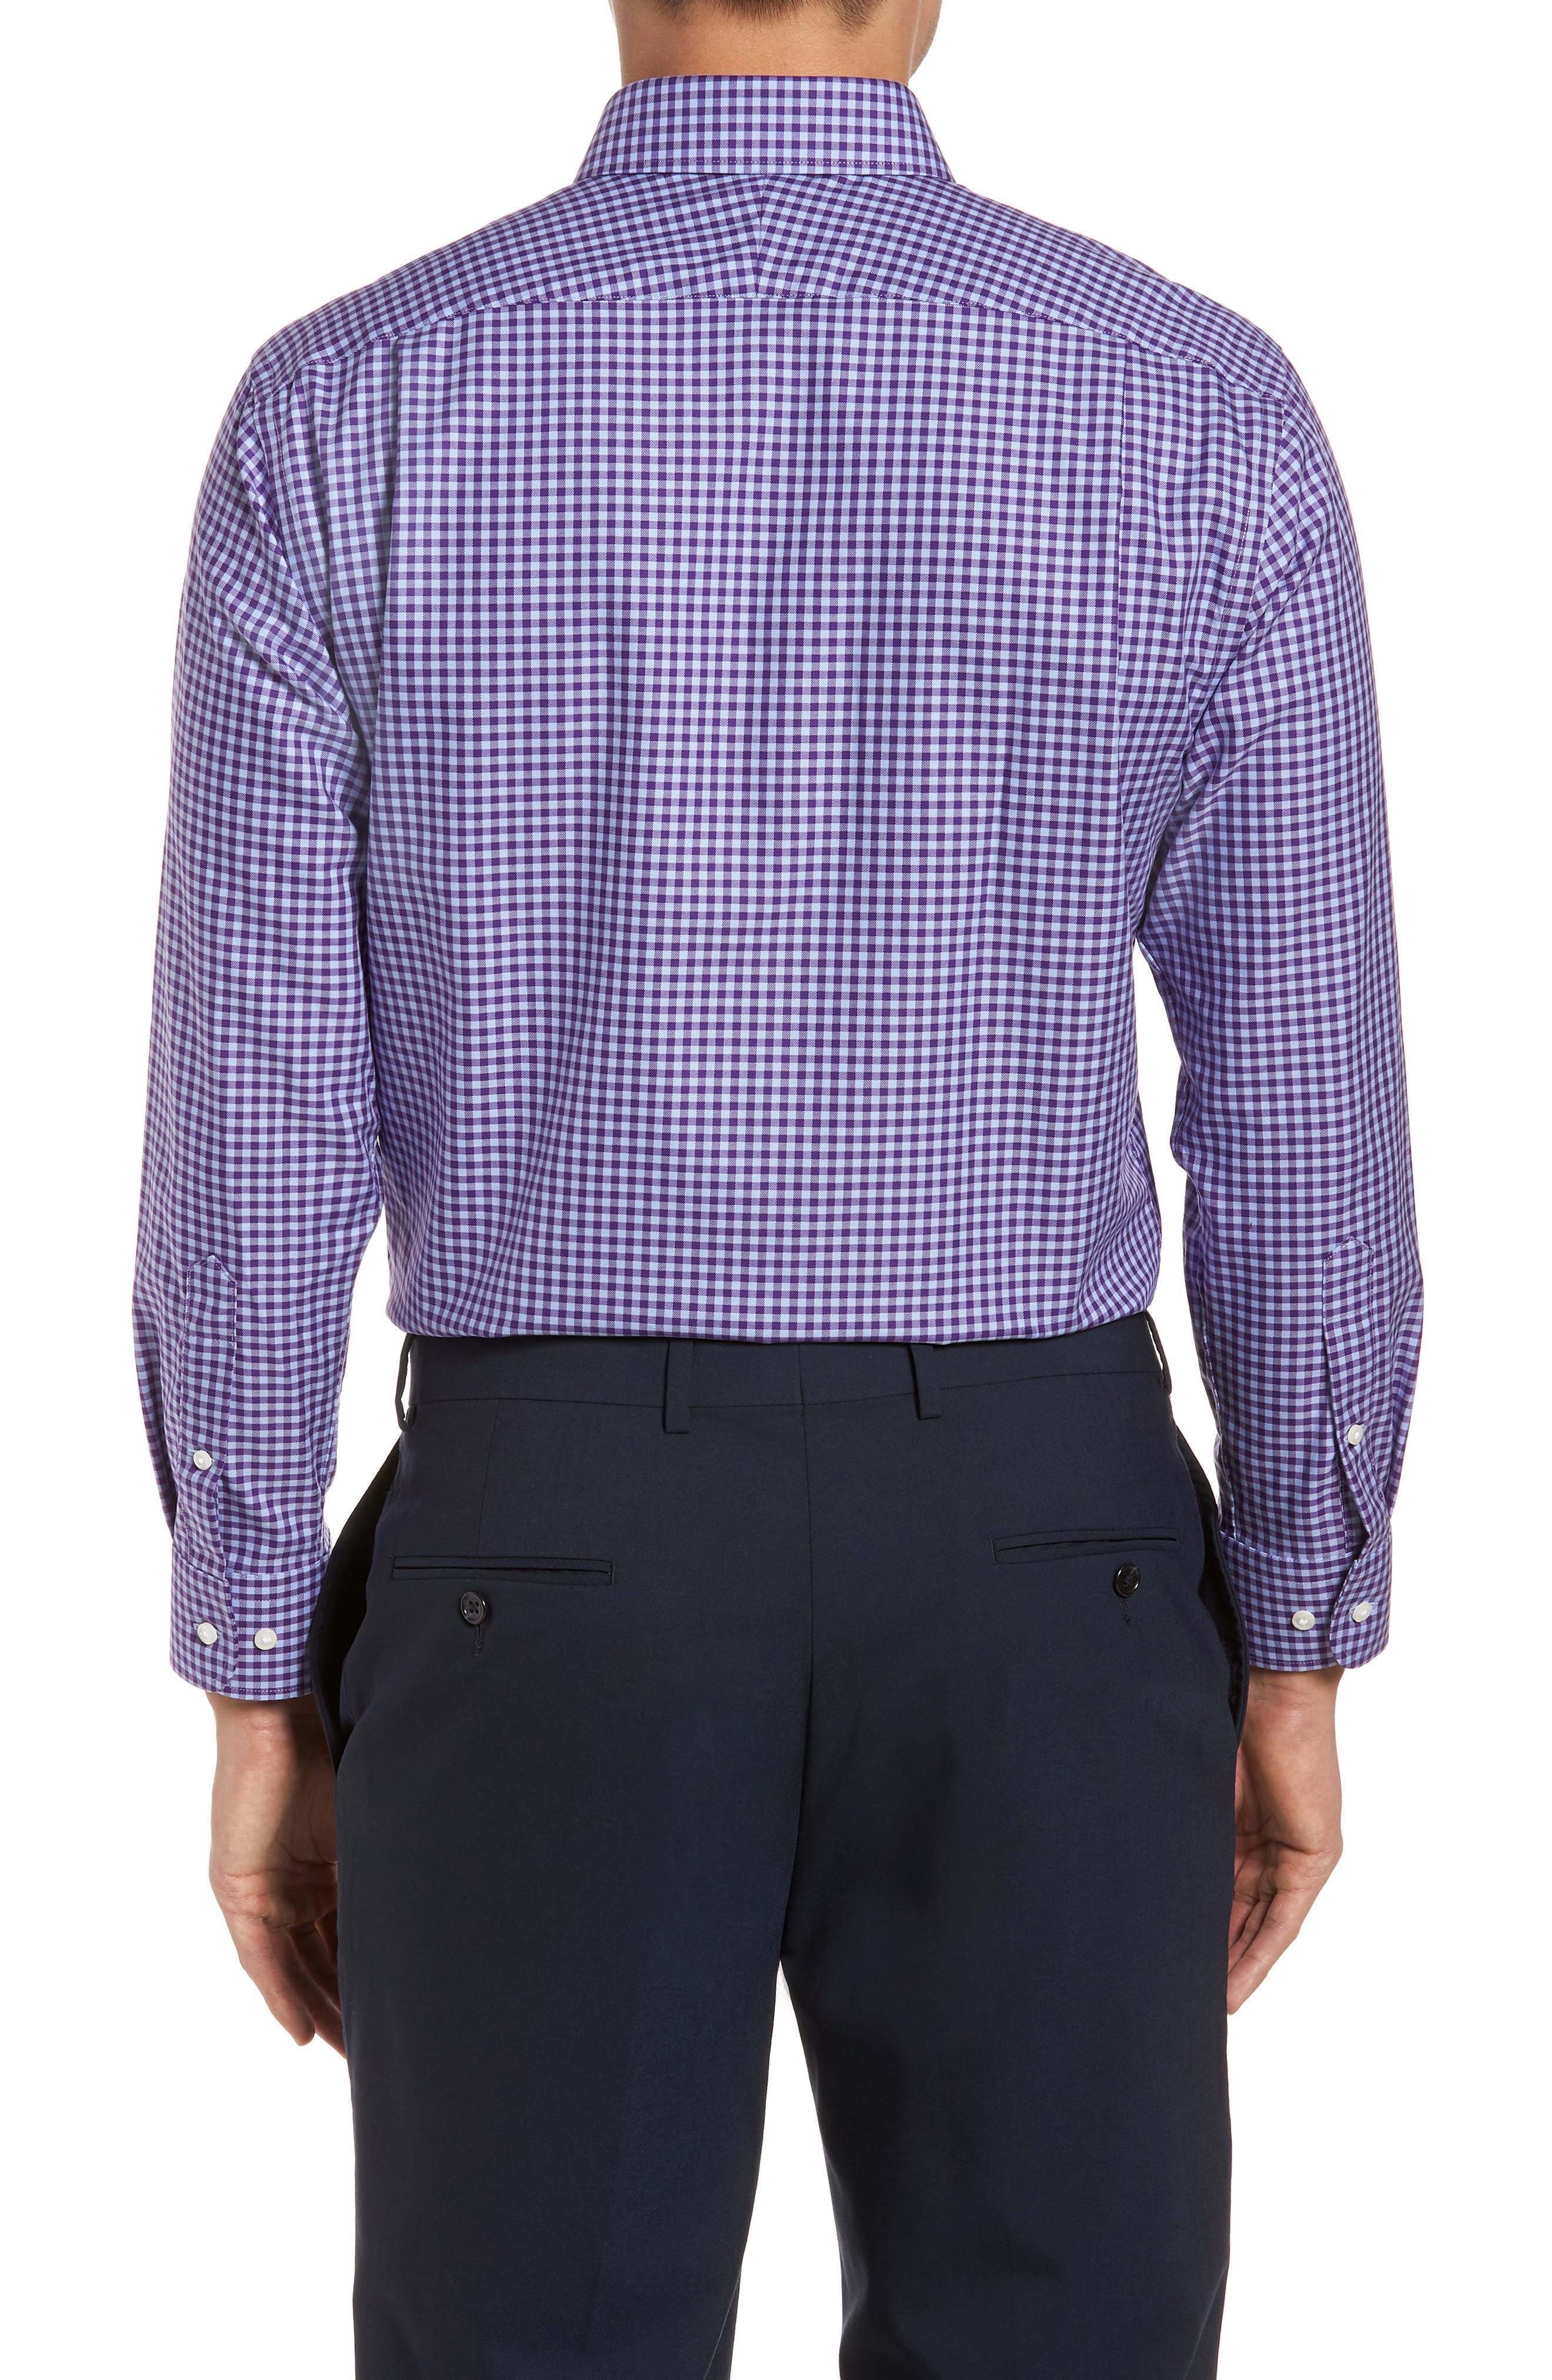 Alternate Image 2  - Nordstrom Men's Shop Trim Fit Non-Iron Gingham Dress Shirt